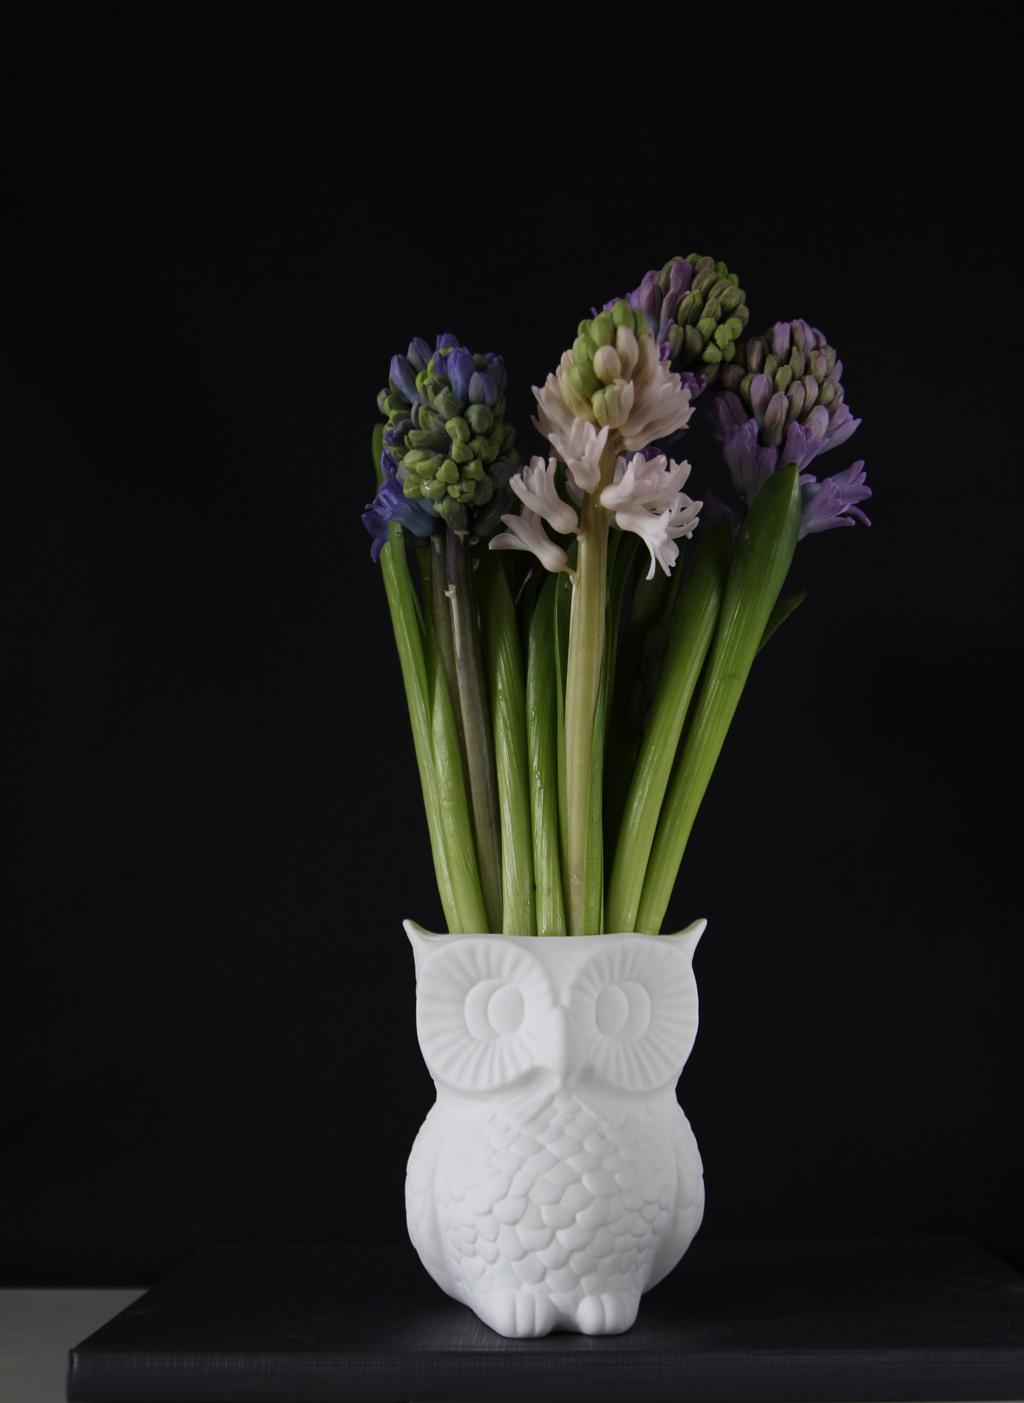 2 flower girls - owl vase and yacinths